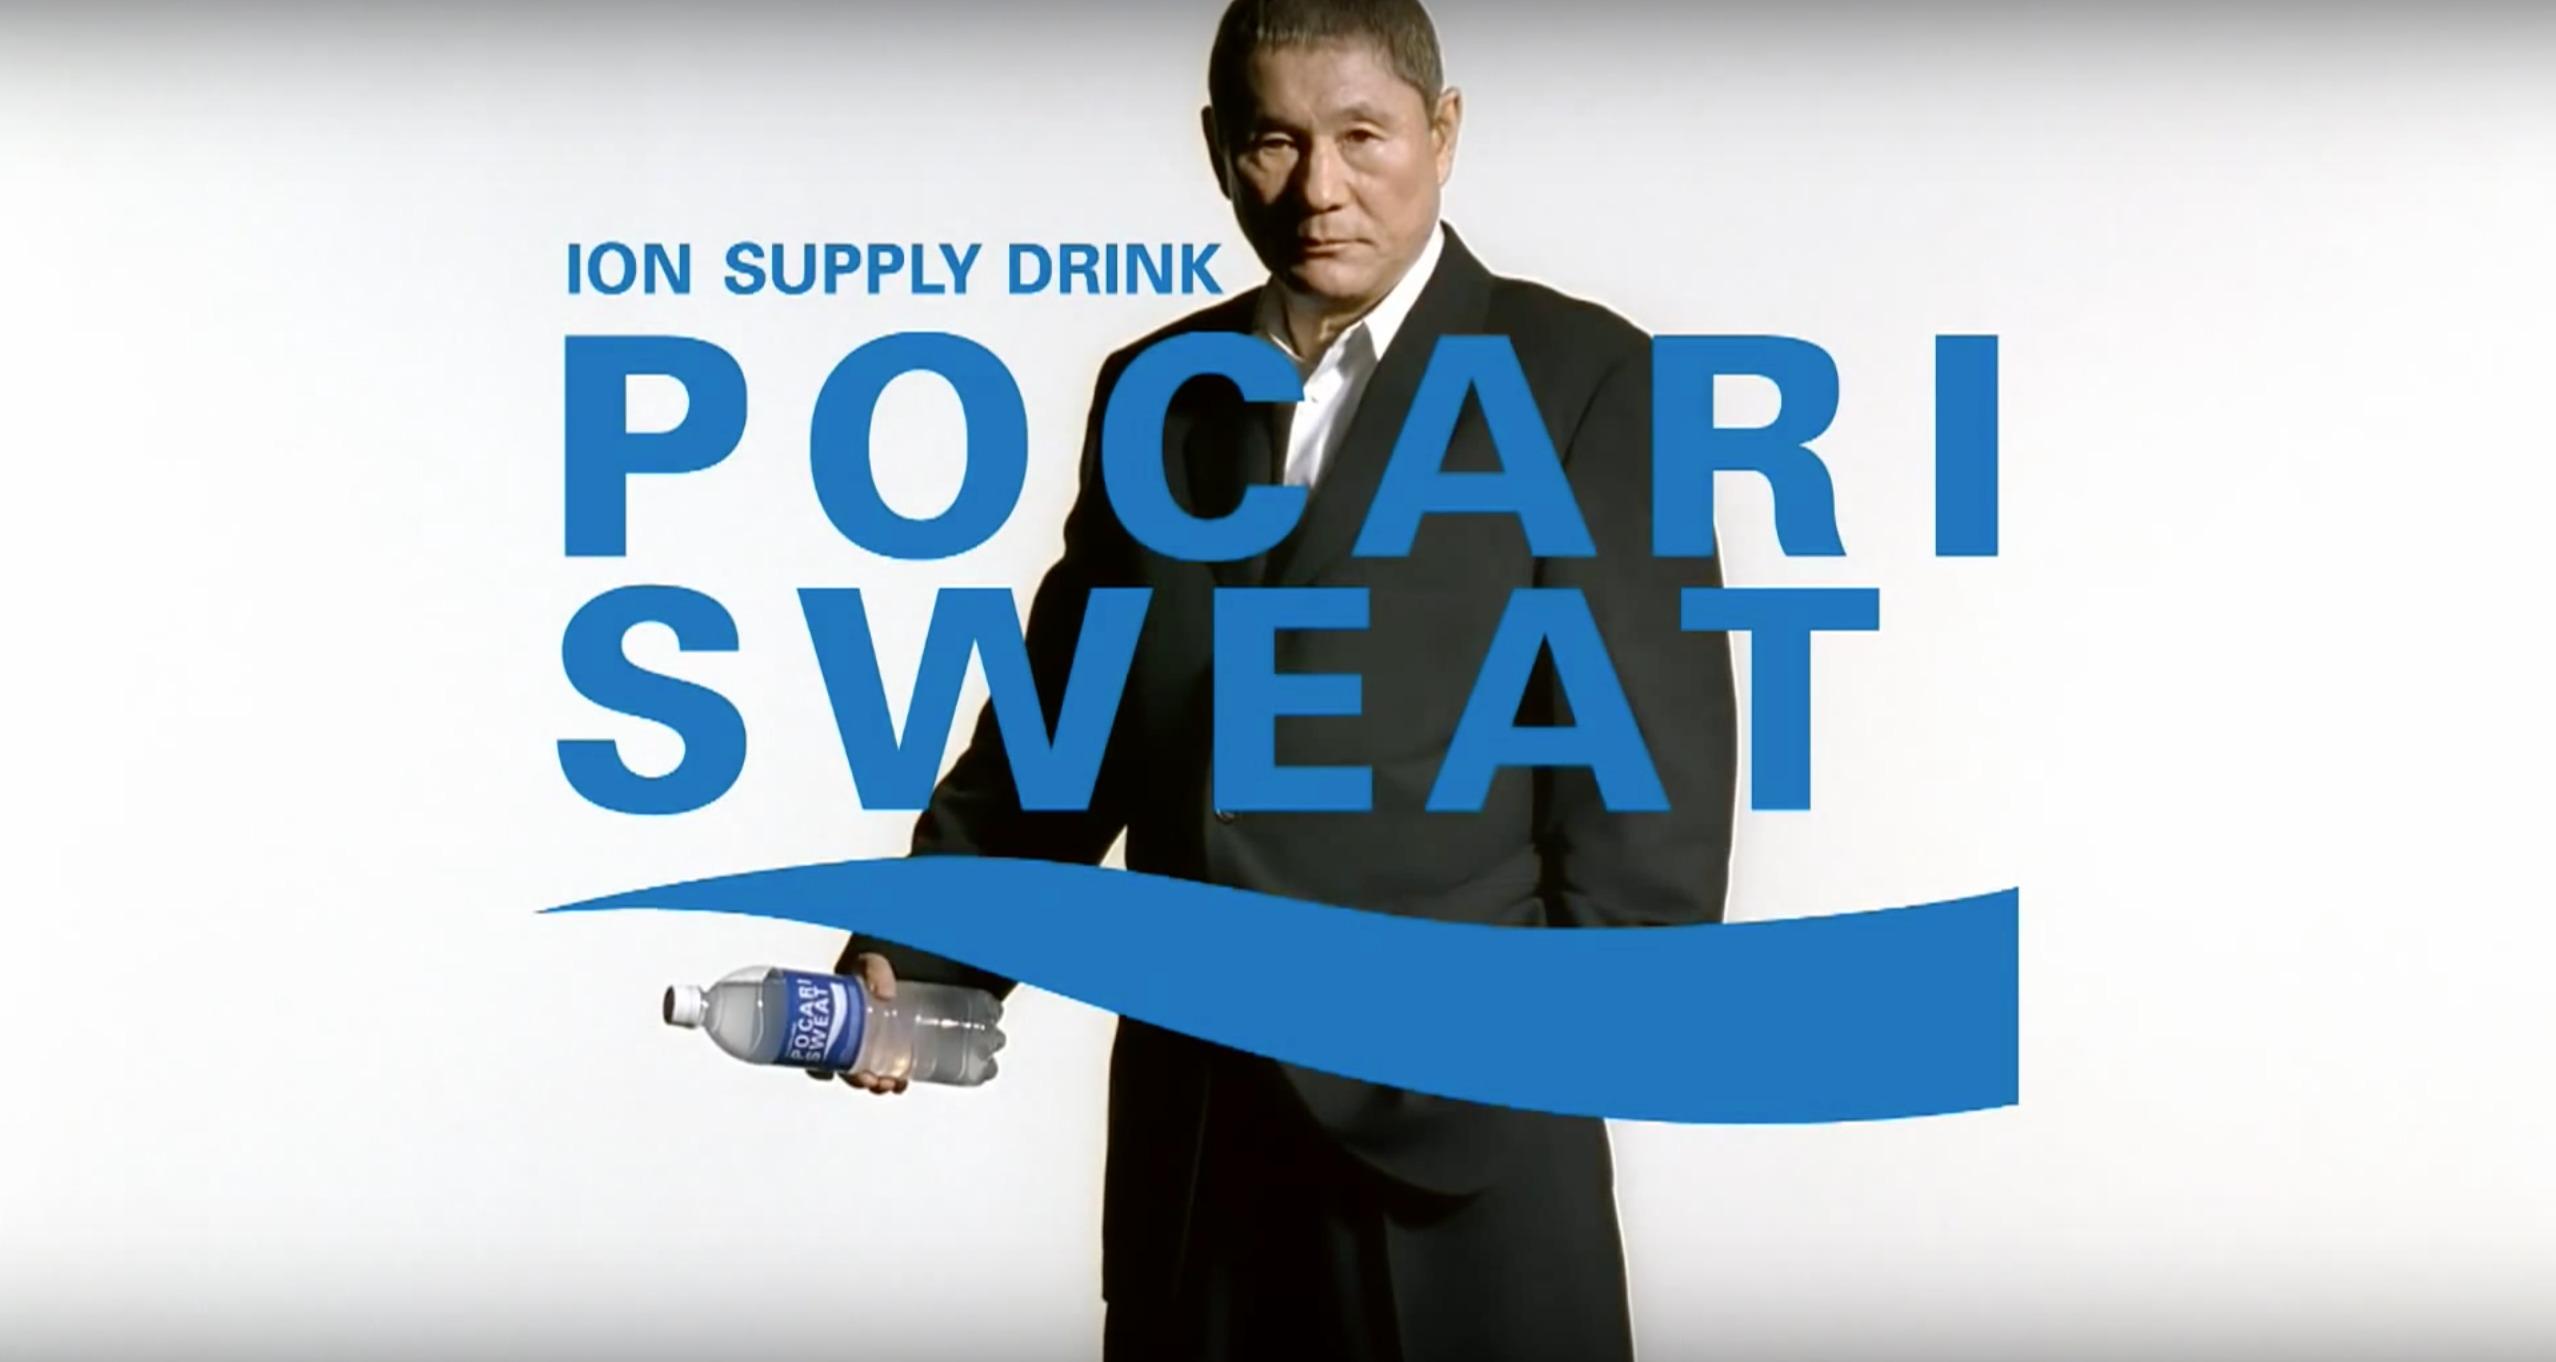 pocari-sweat-advertizment